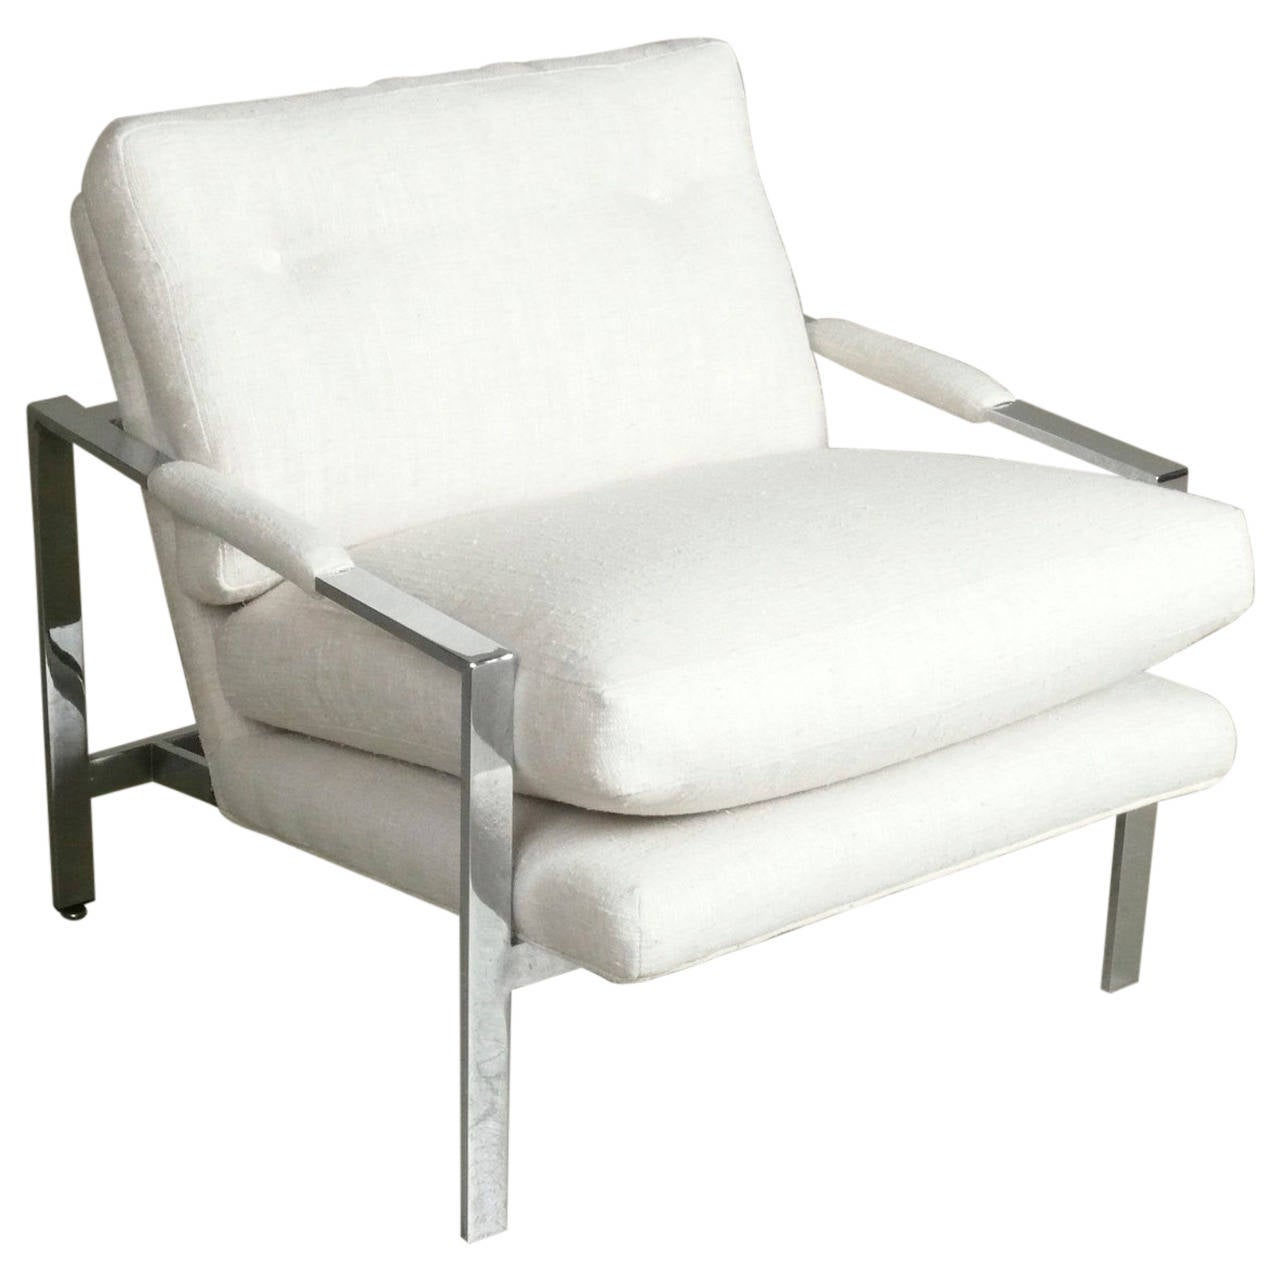 Milo baughman lounge chair at 1stdibs